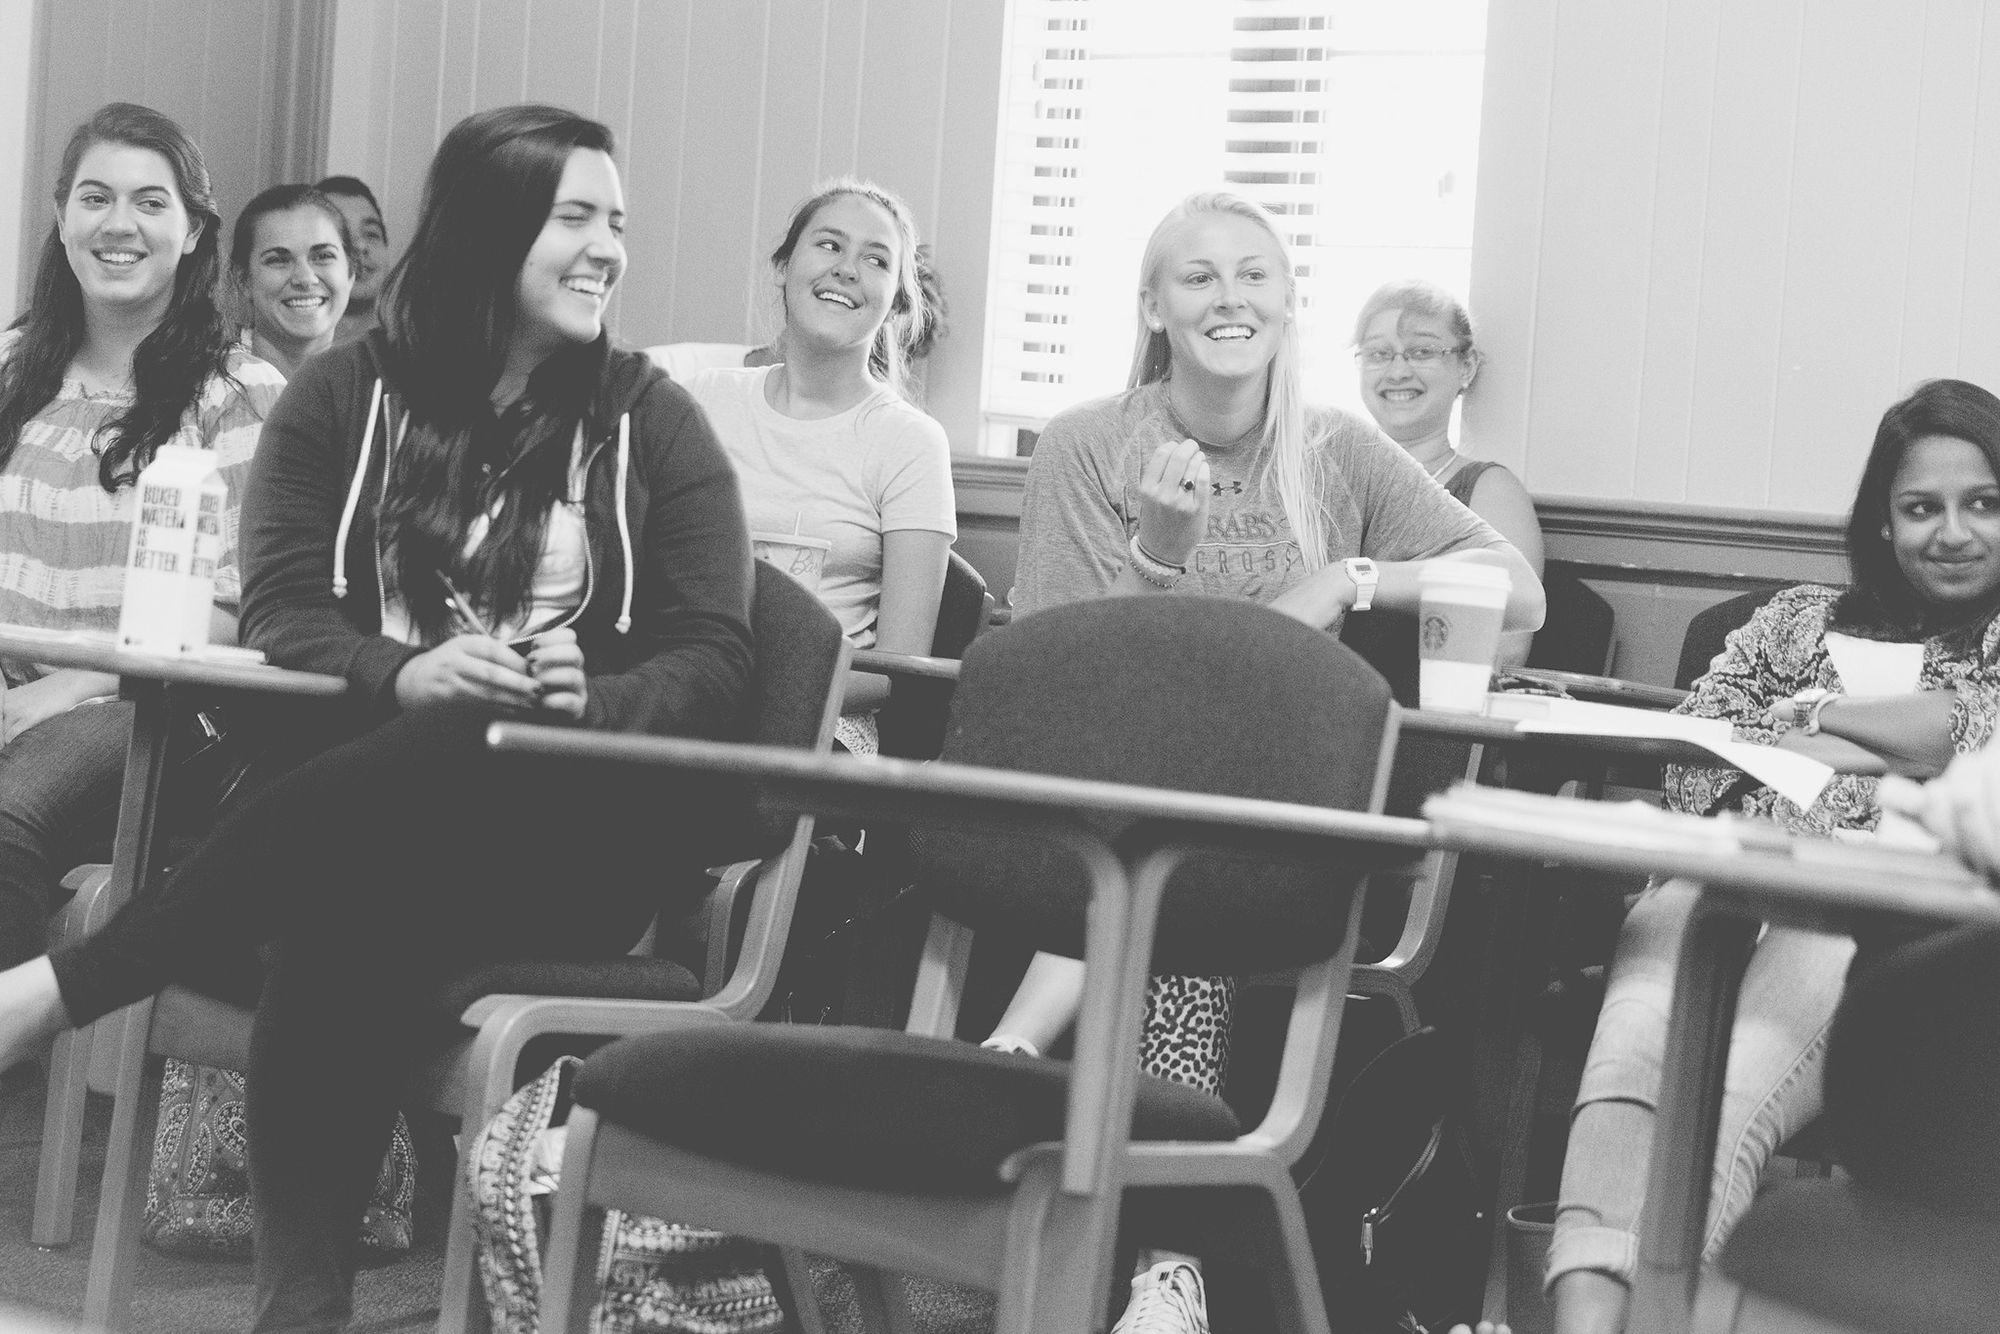 Philosophy students sitting in desks smiling.